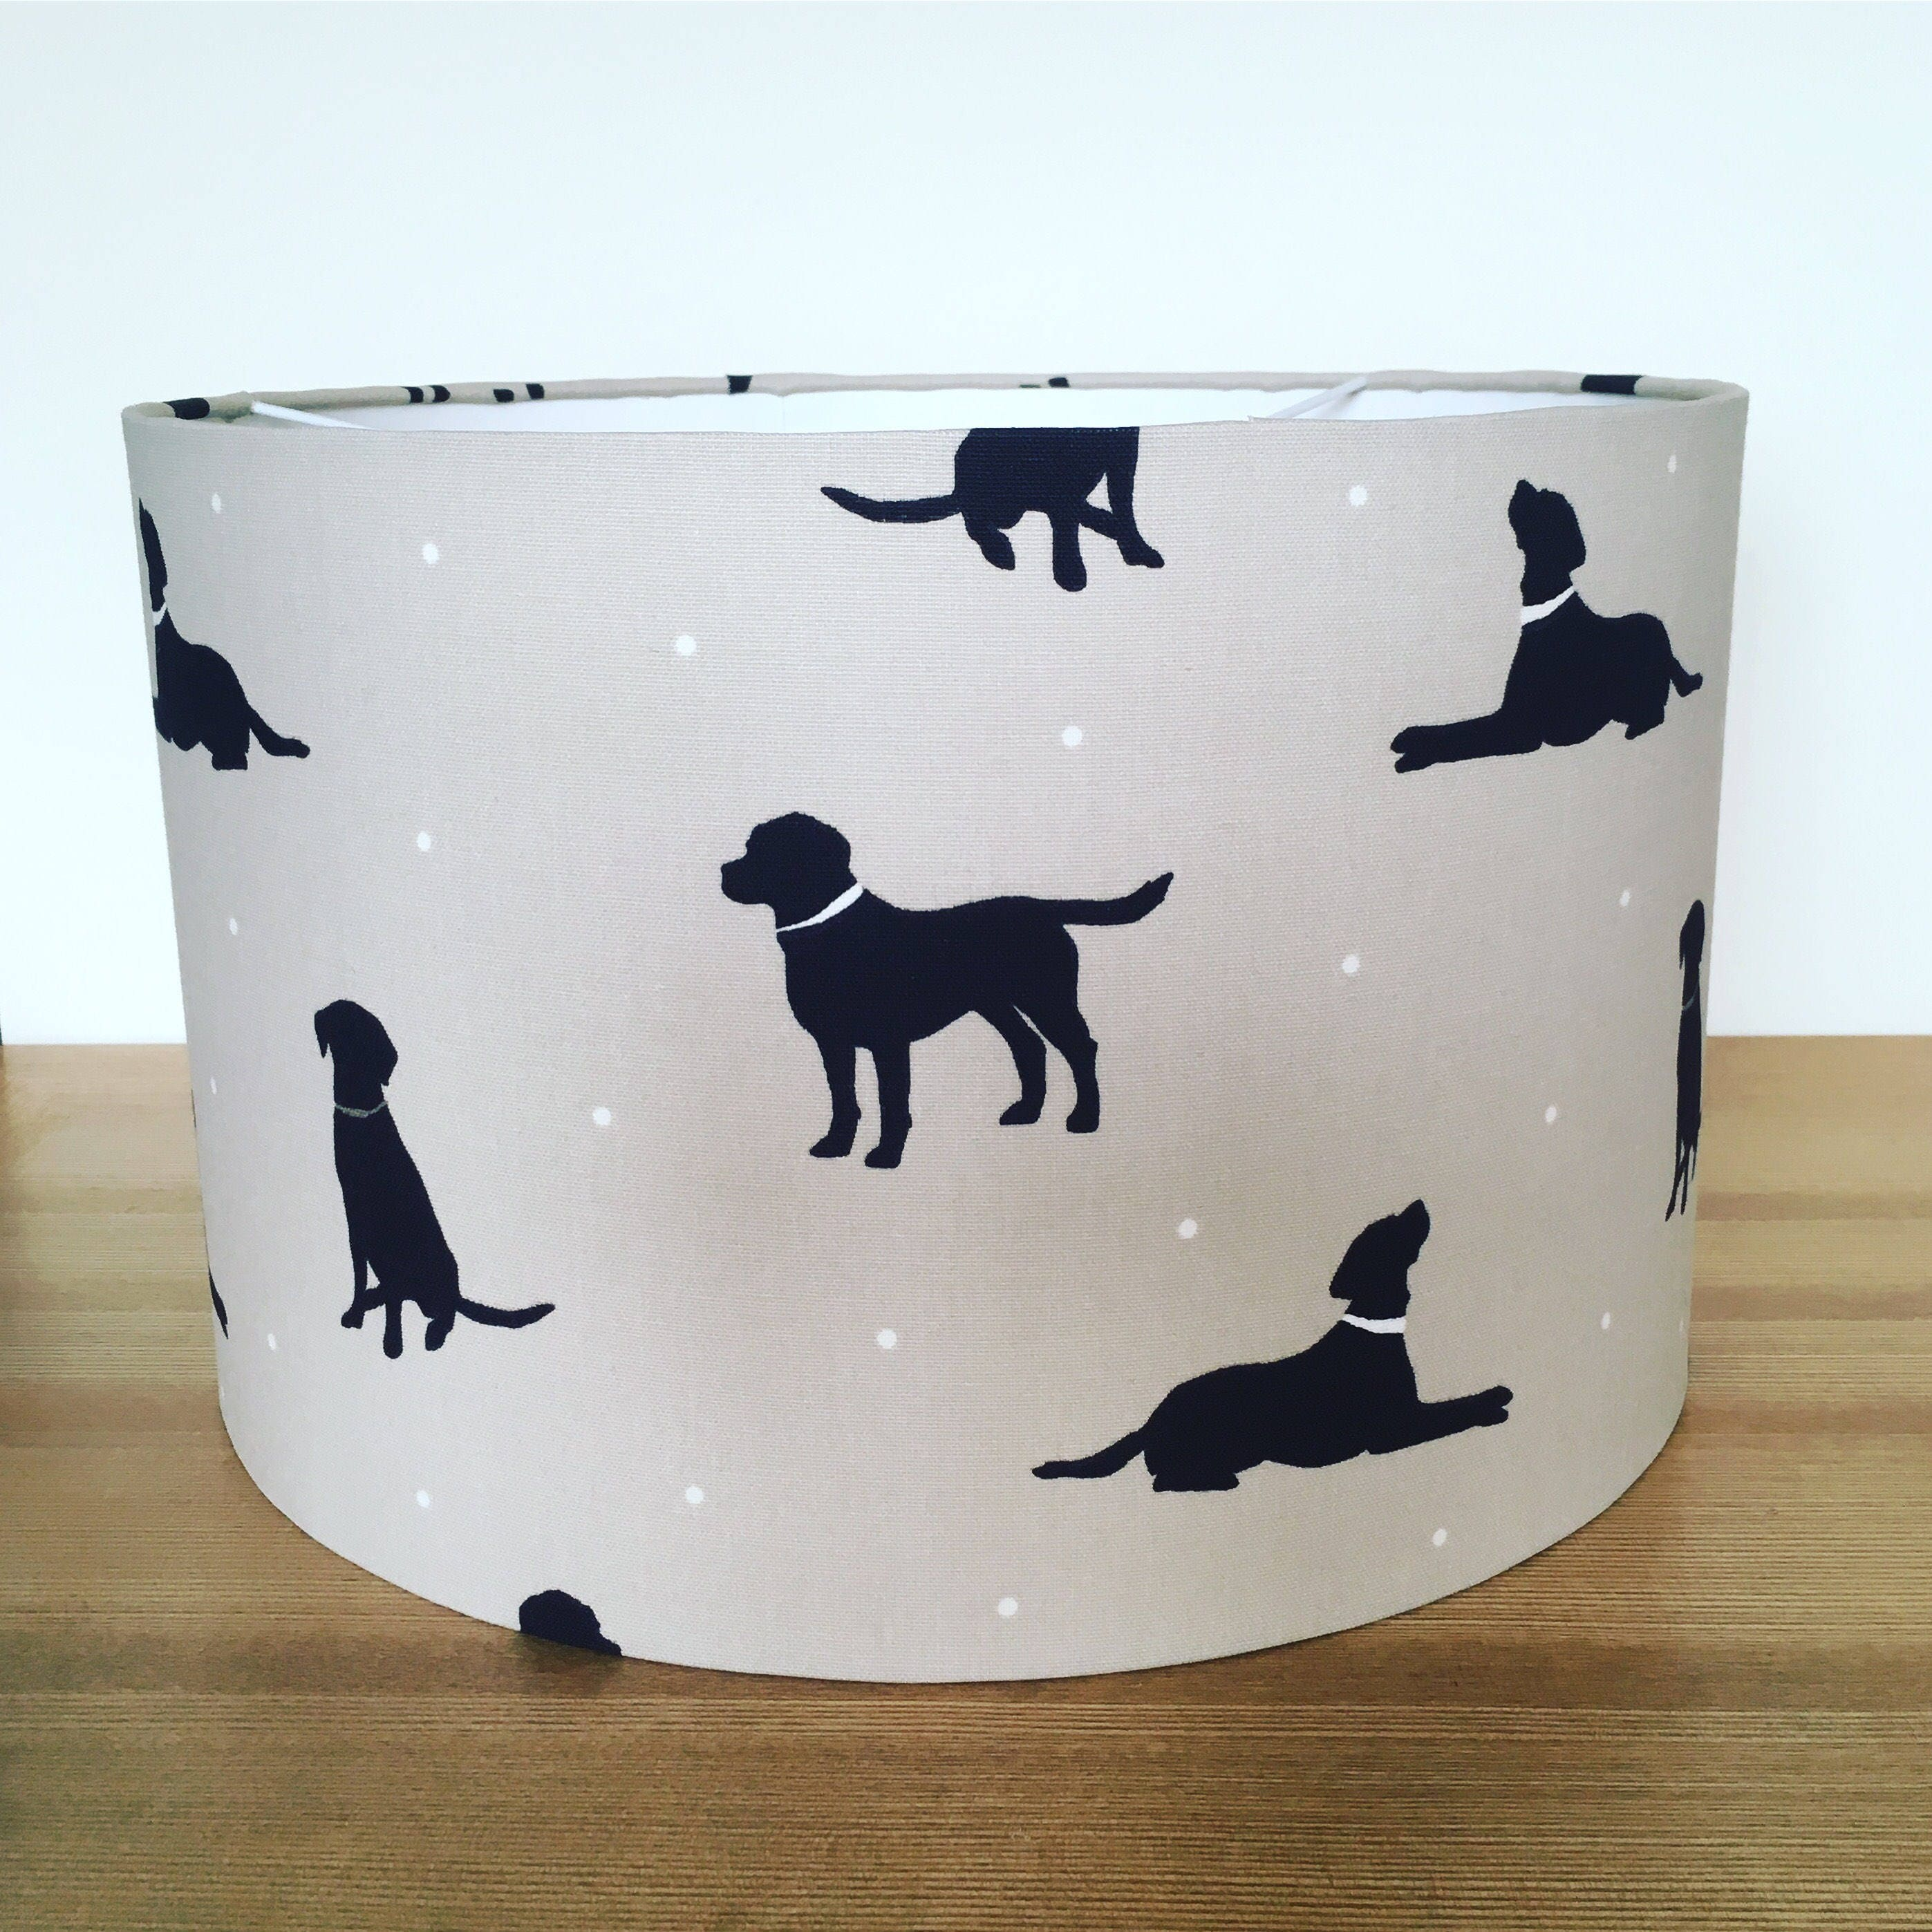 Handmade Fabric Lampshade Black Labradors  dogs